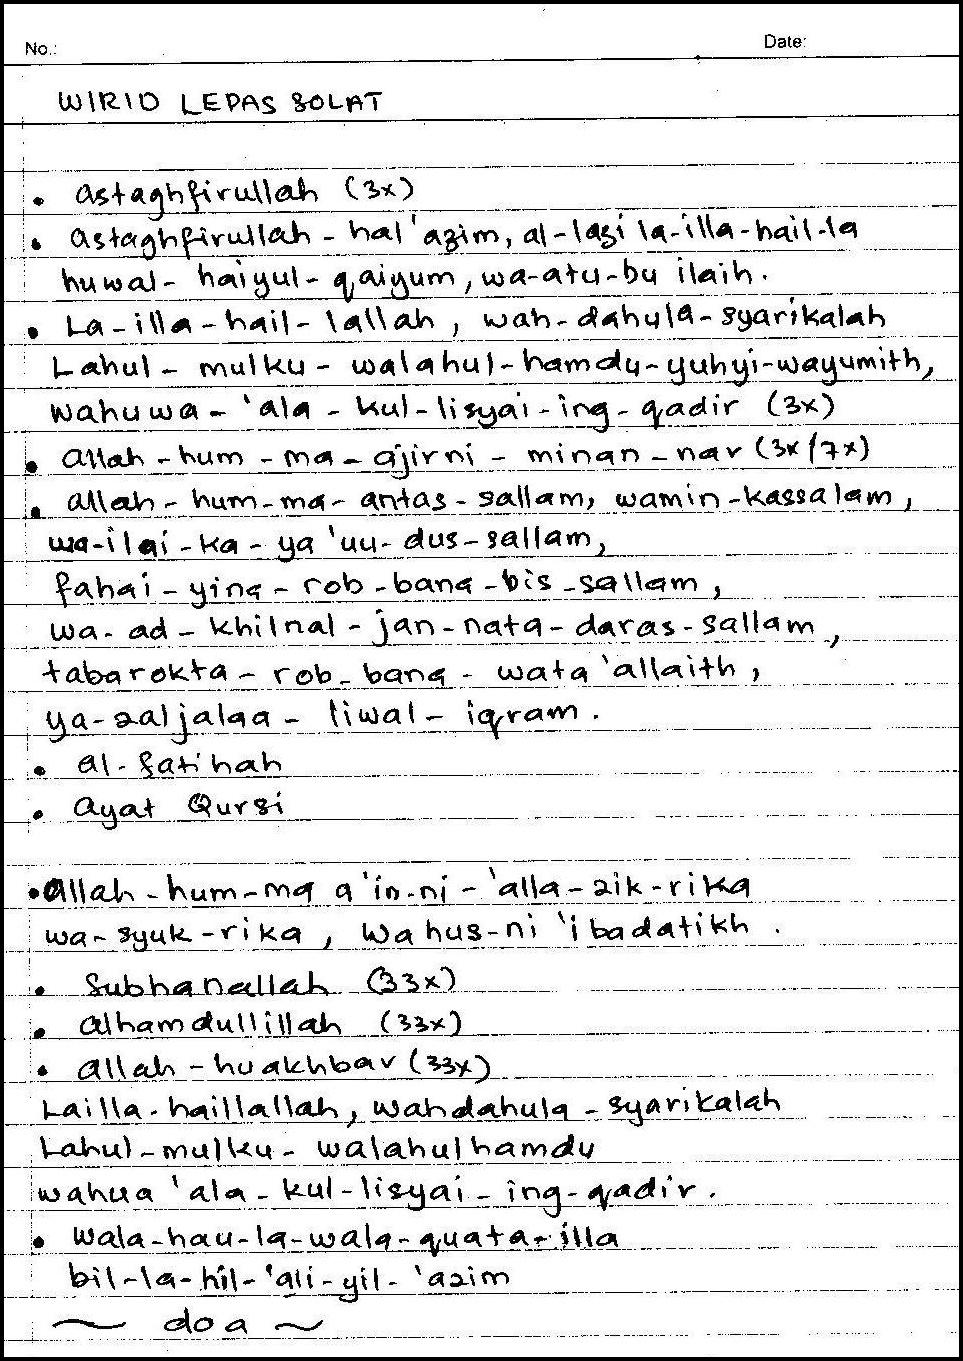 The Kasihs Wirid Lepas Solat